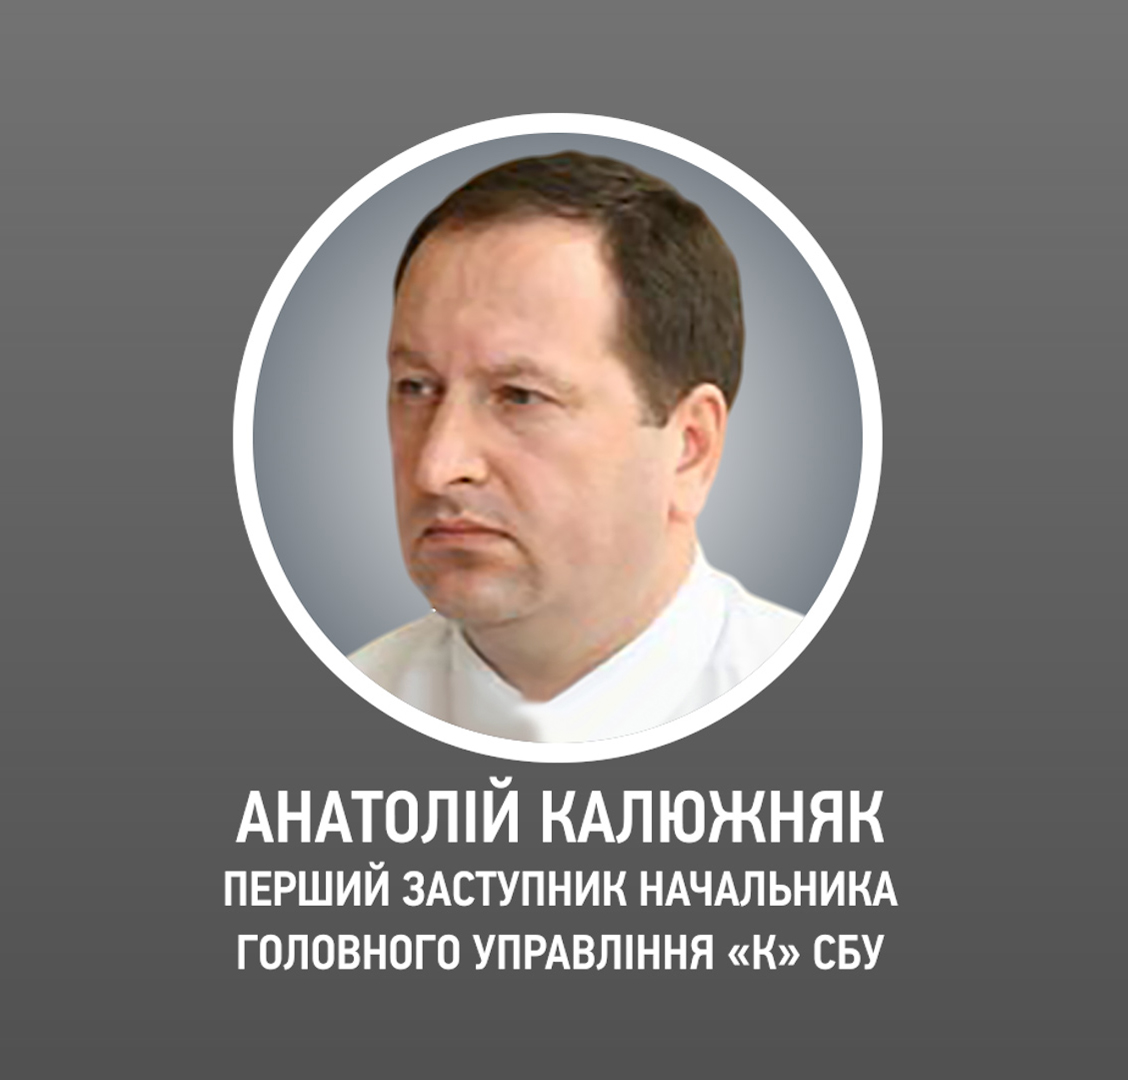 https://www.slidstvo.info/wp-content/uploads/2019/06/img_1_crop.jpg